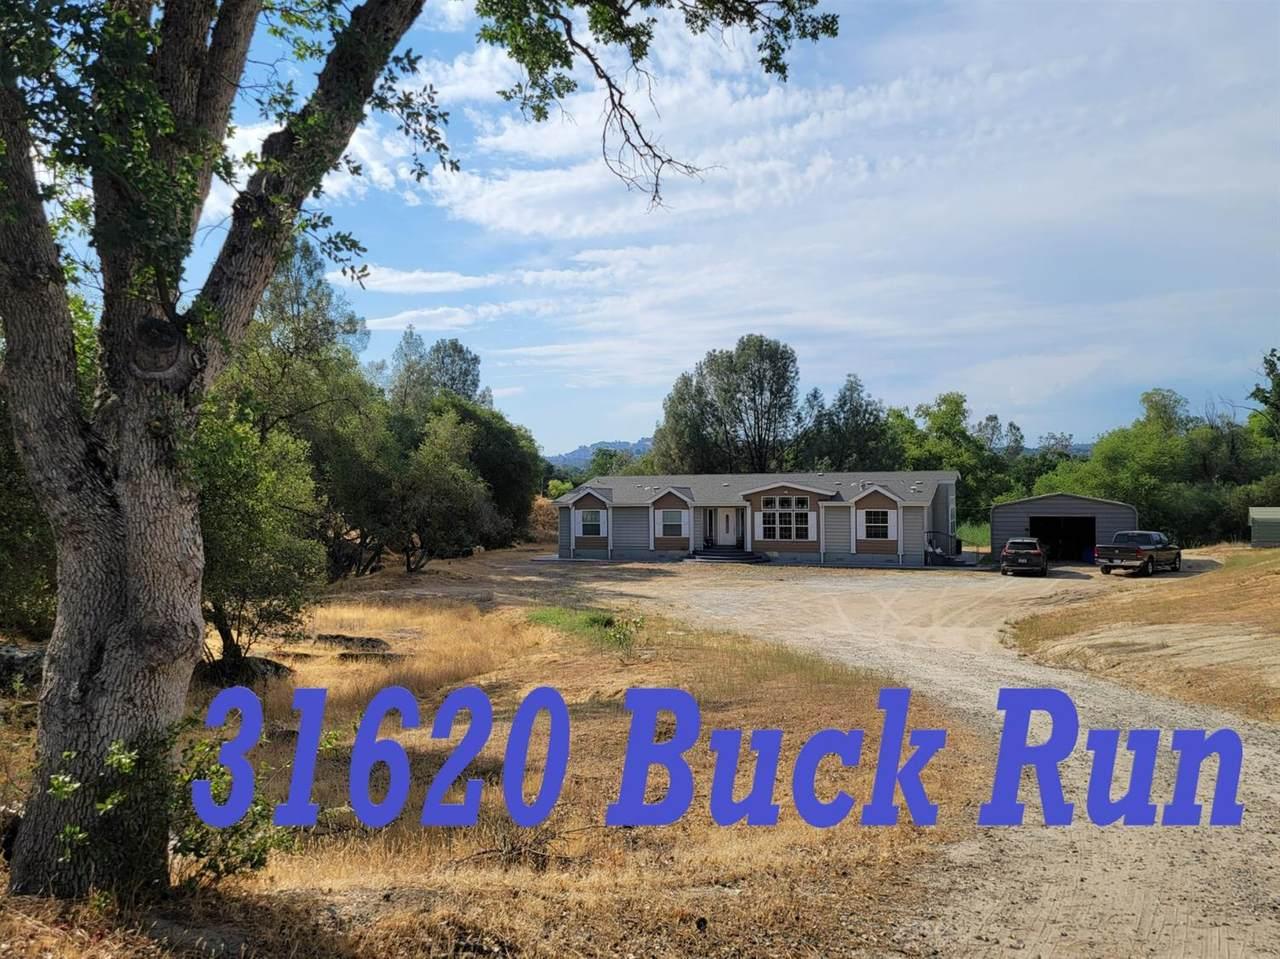 31614-31620 Buck Run Lane - Photo 1